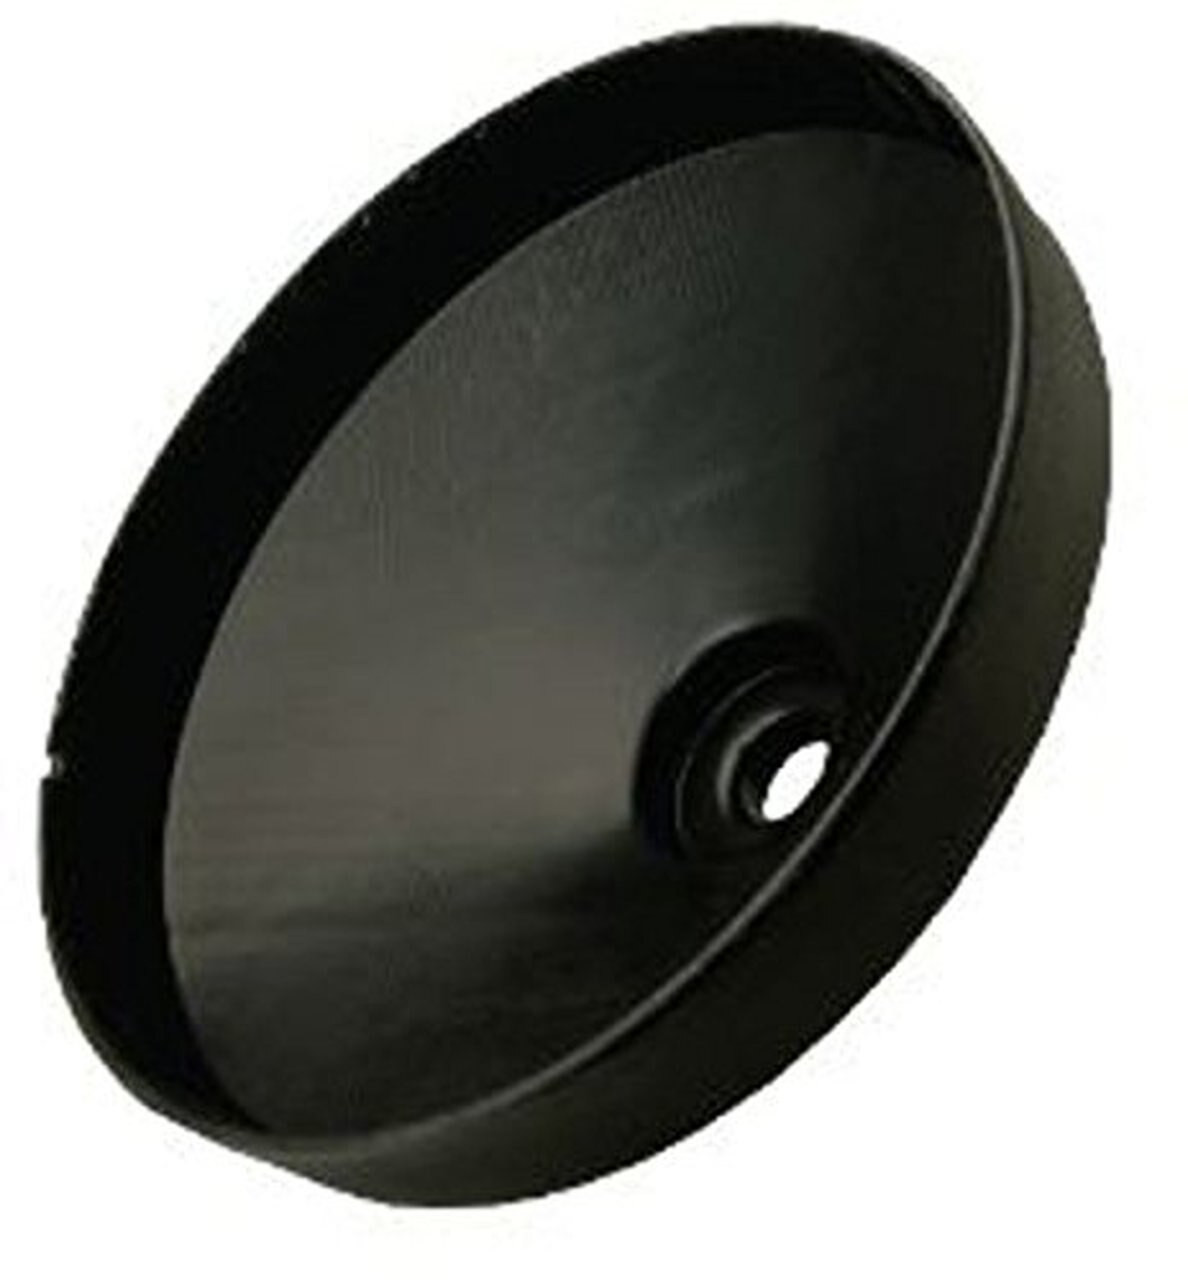 AH 55 Gallon Polyethylene Funnel 41001